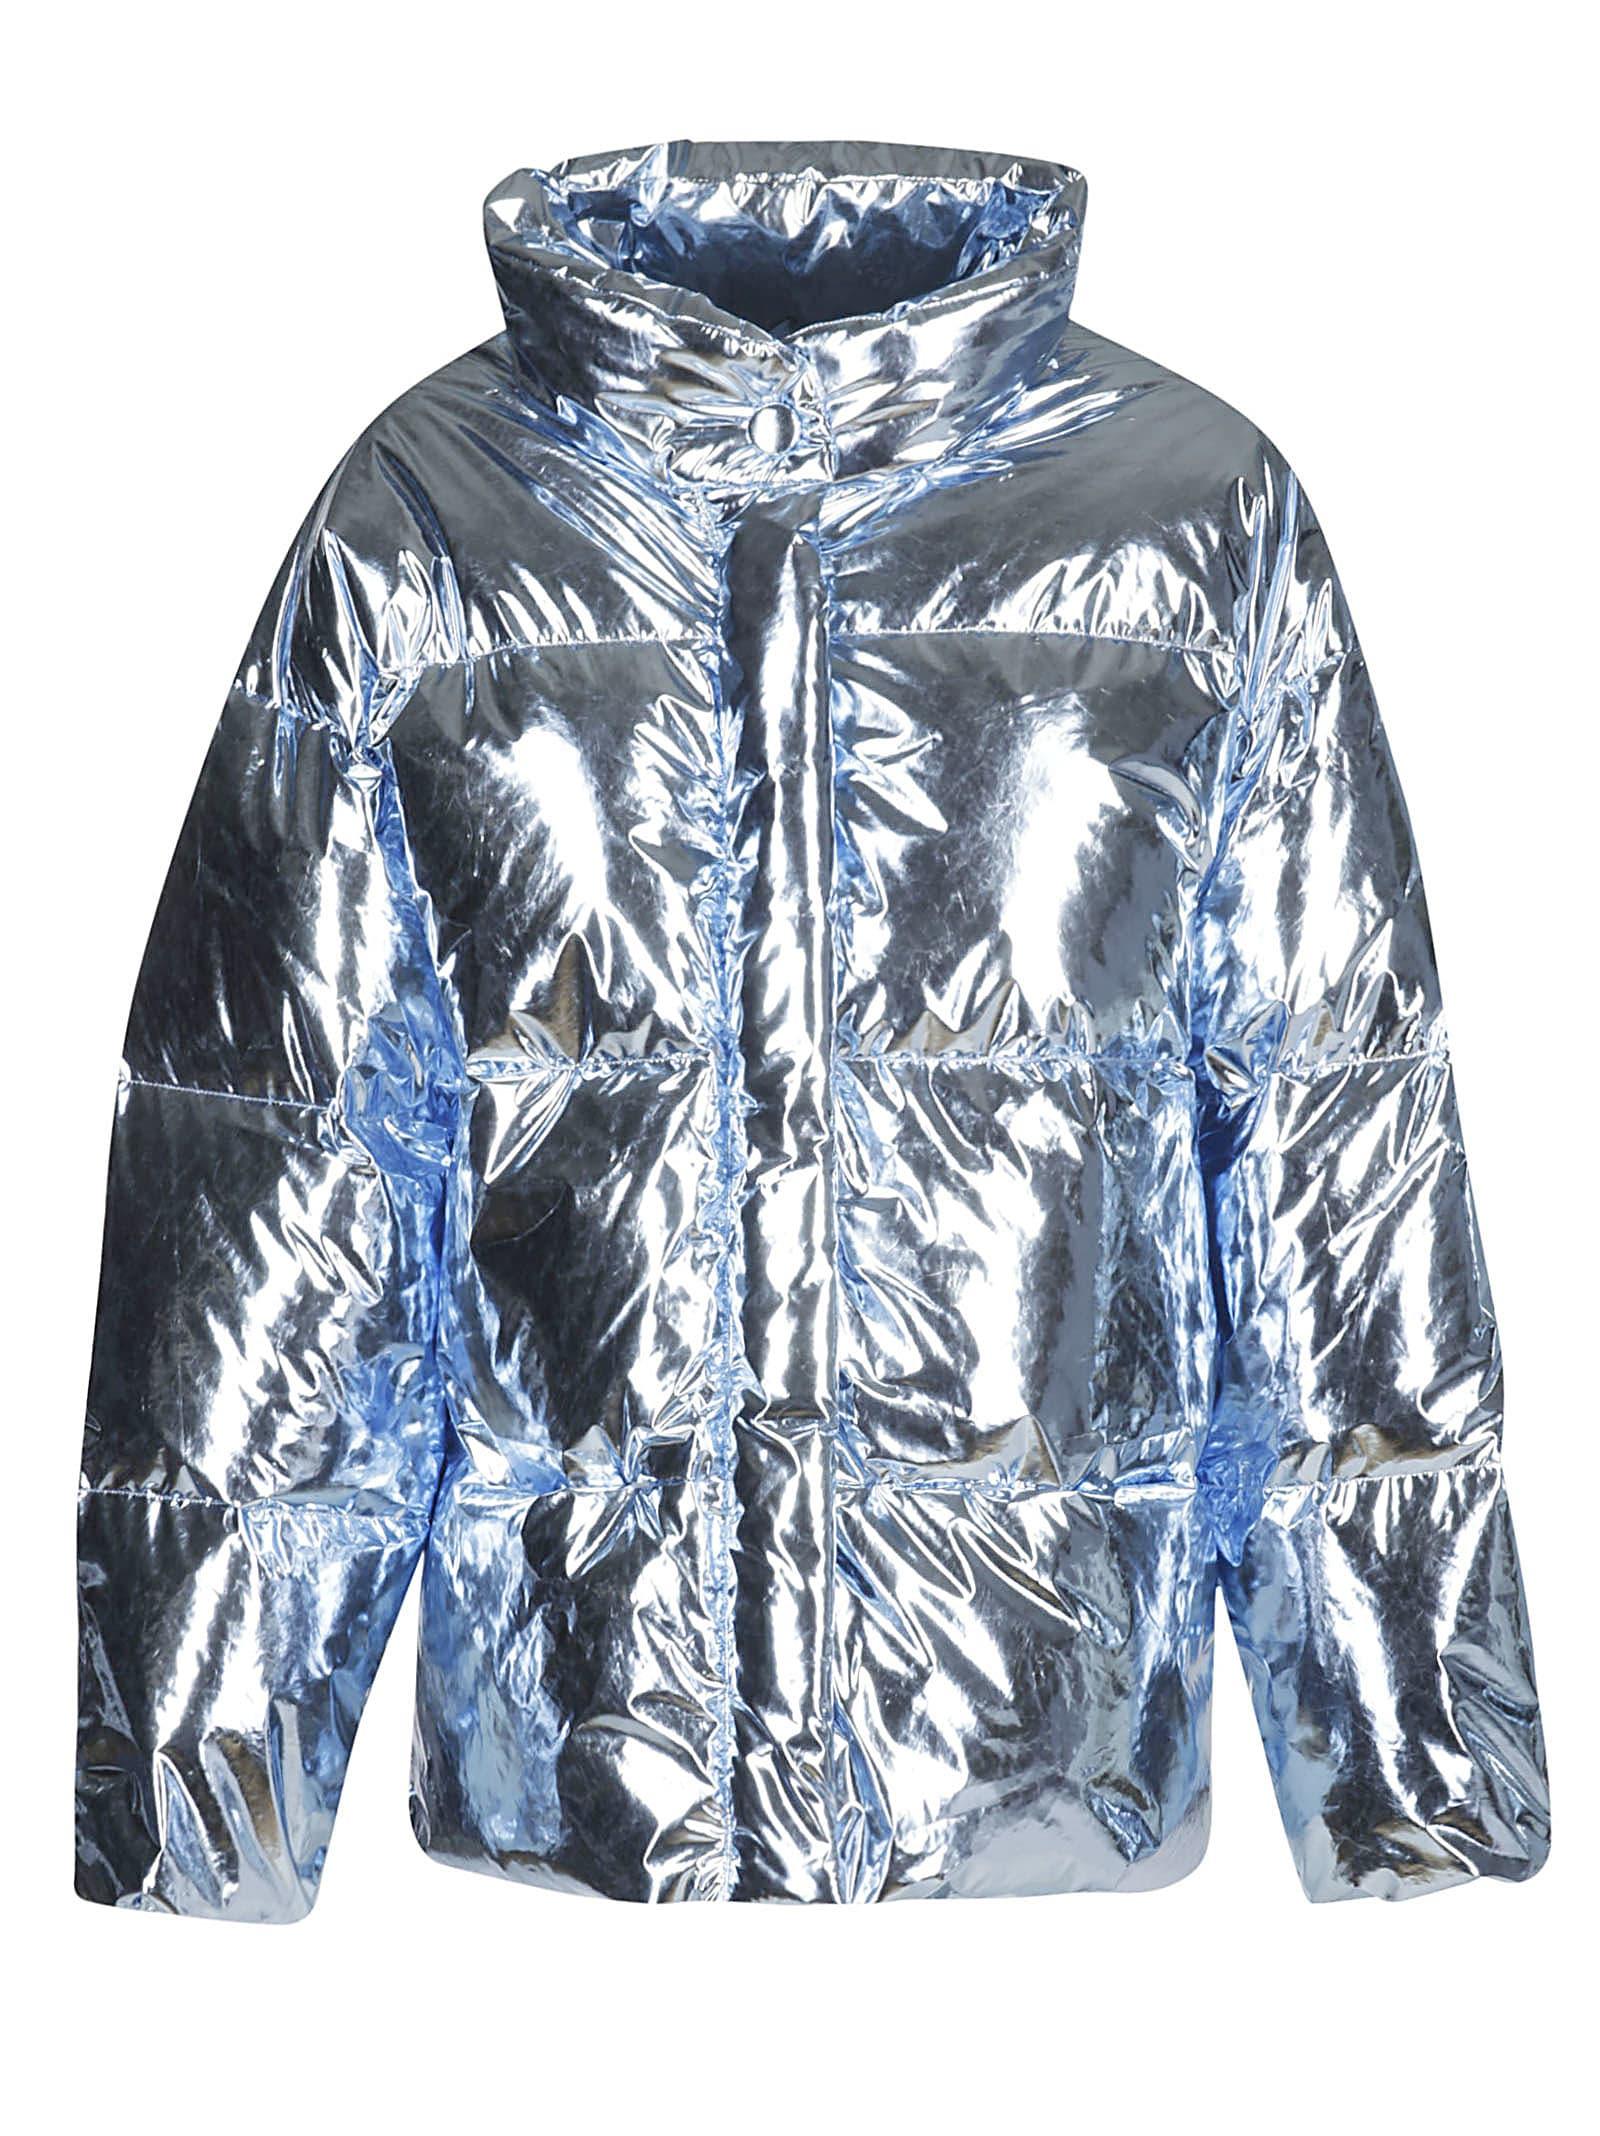 IENKI IENKI Metallic Vent Jacket